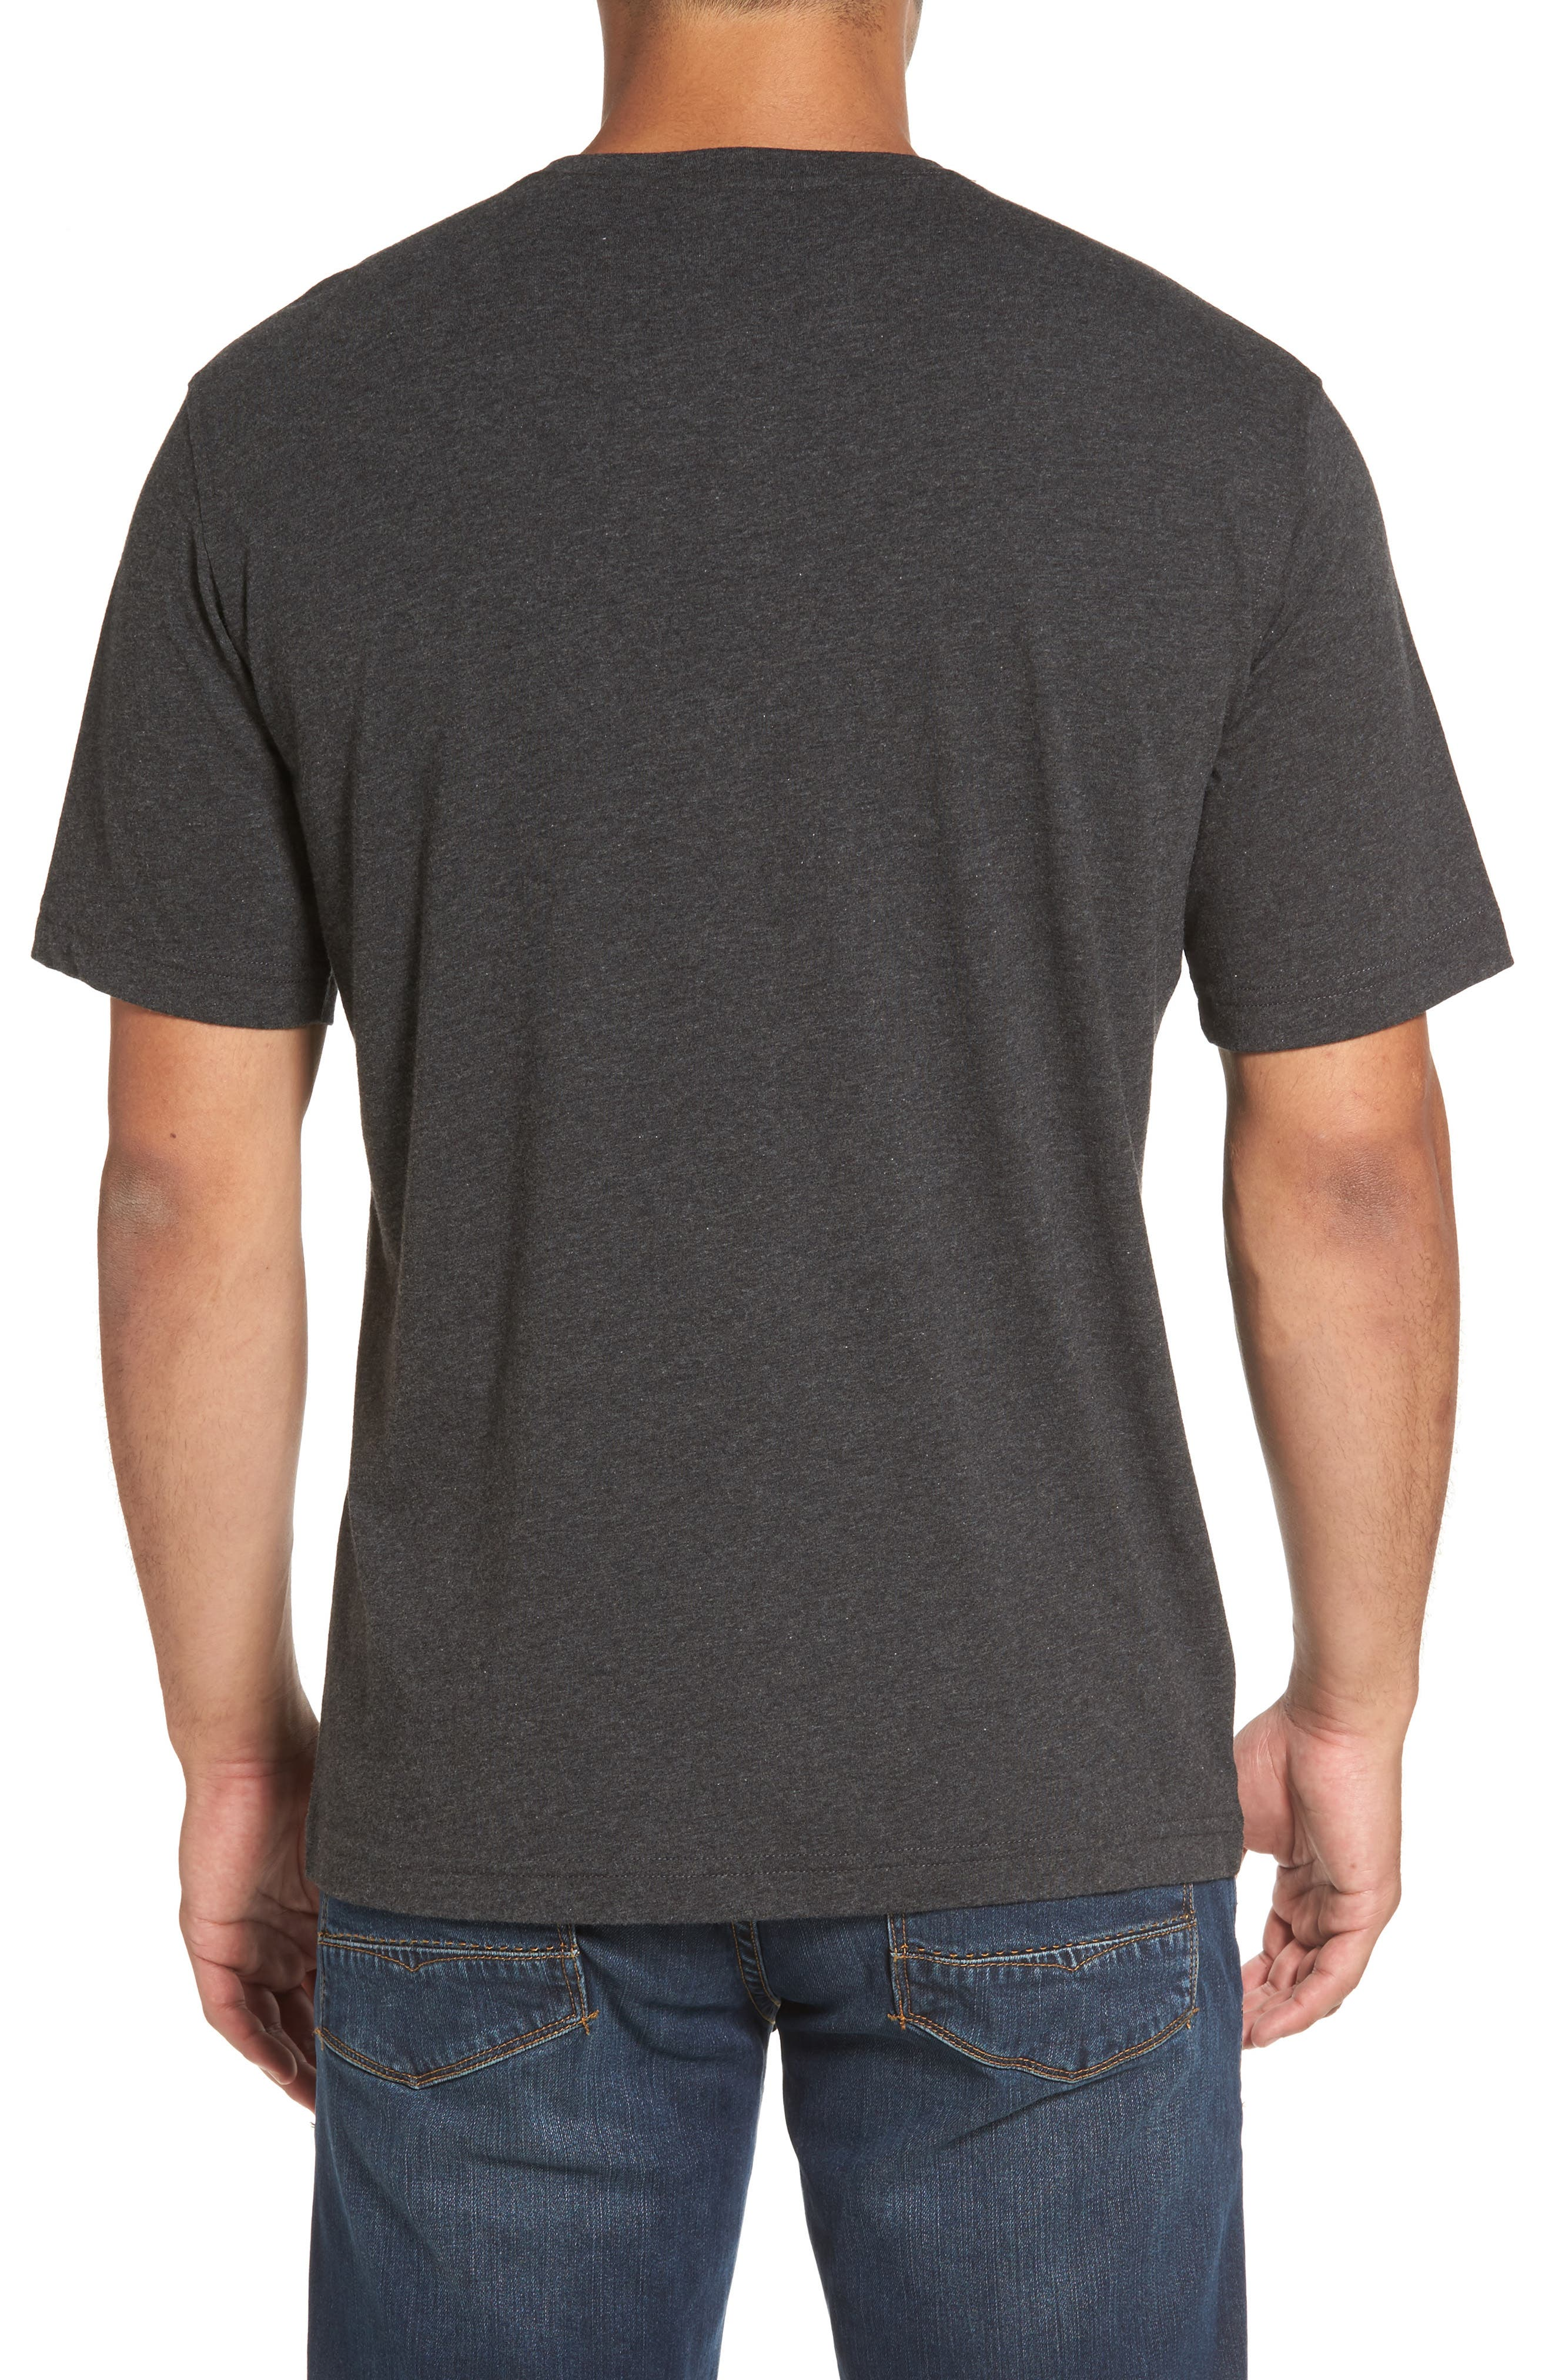 Crown Pocket T-Shirt,                             Alternate thumbnail 2, color,                             020